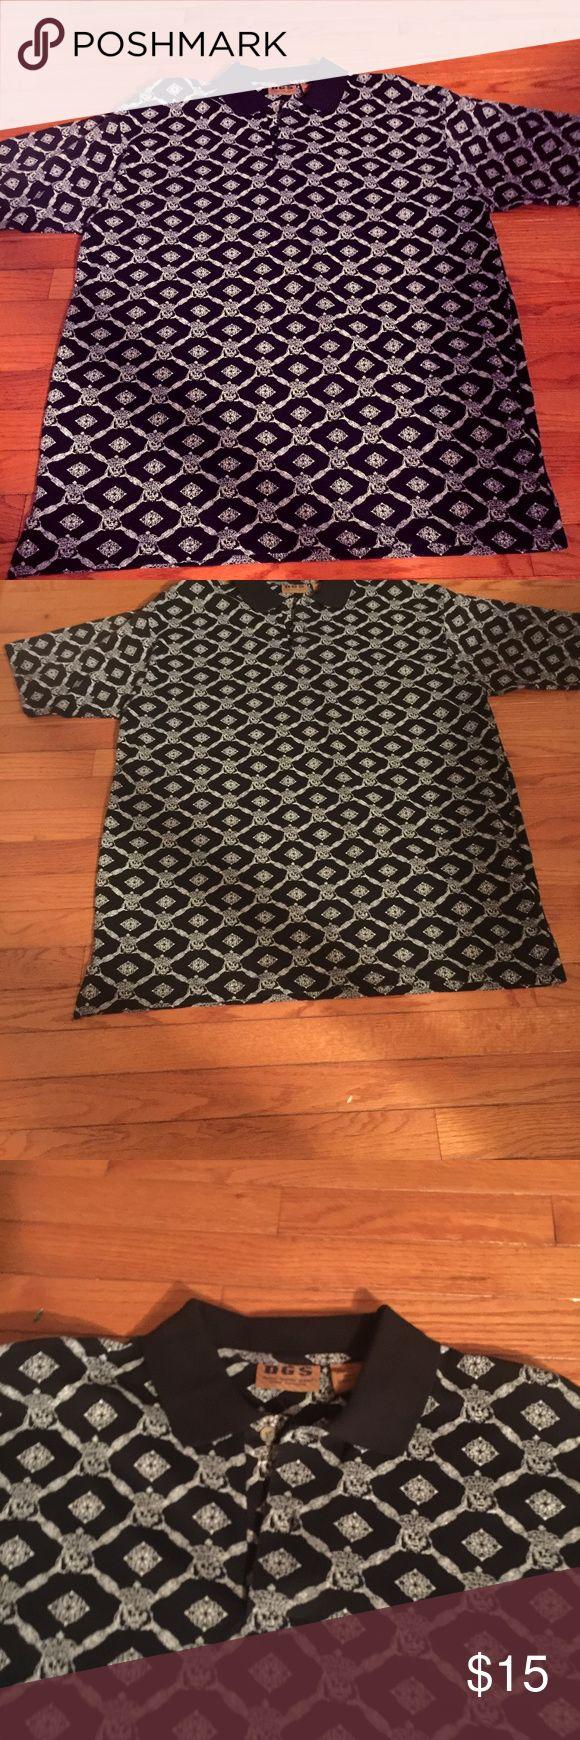 NWT! MENS POLO T-SHIRT MENS POLO T-shirt SIZE XL DGS Shirts Polos